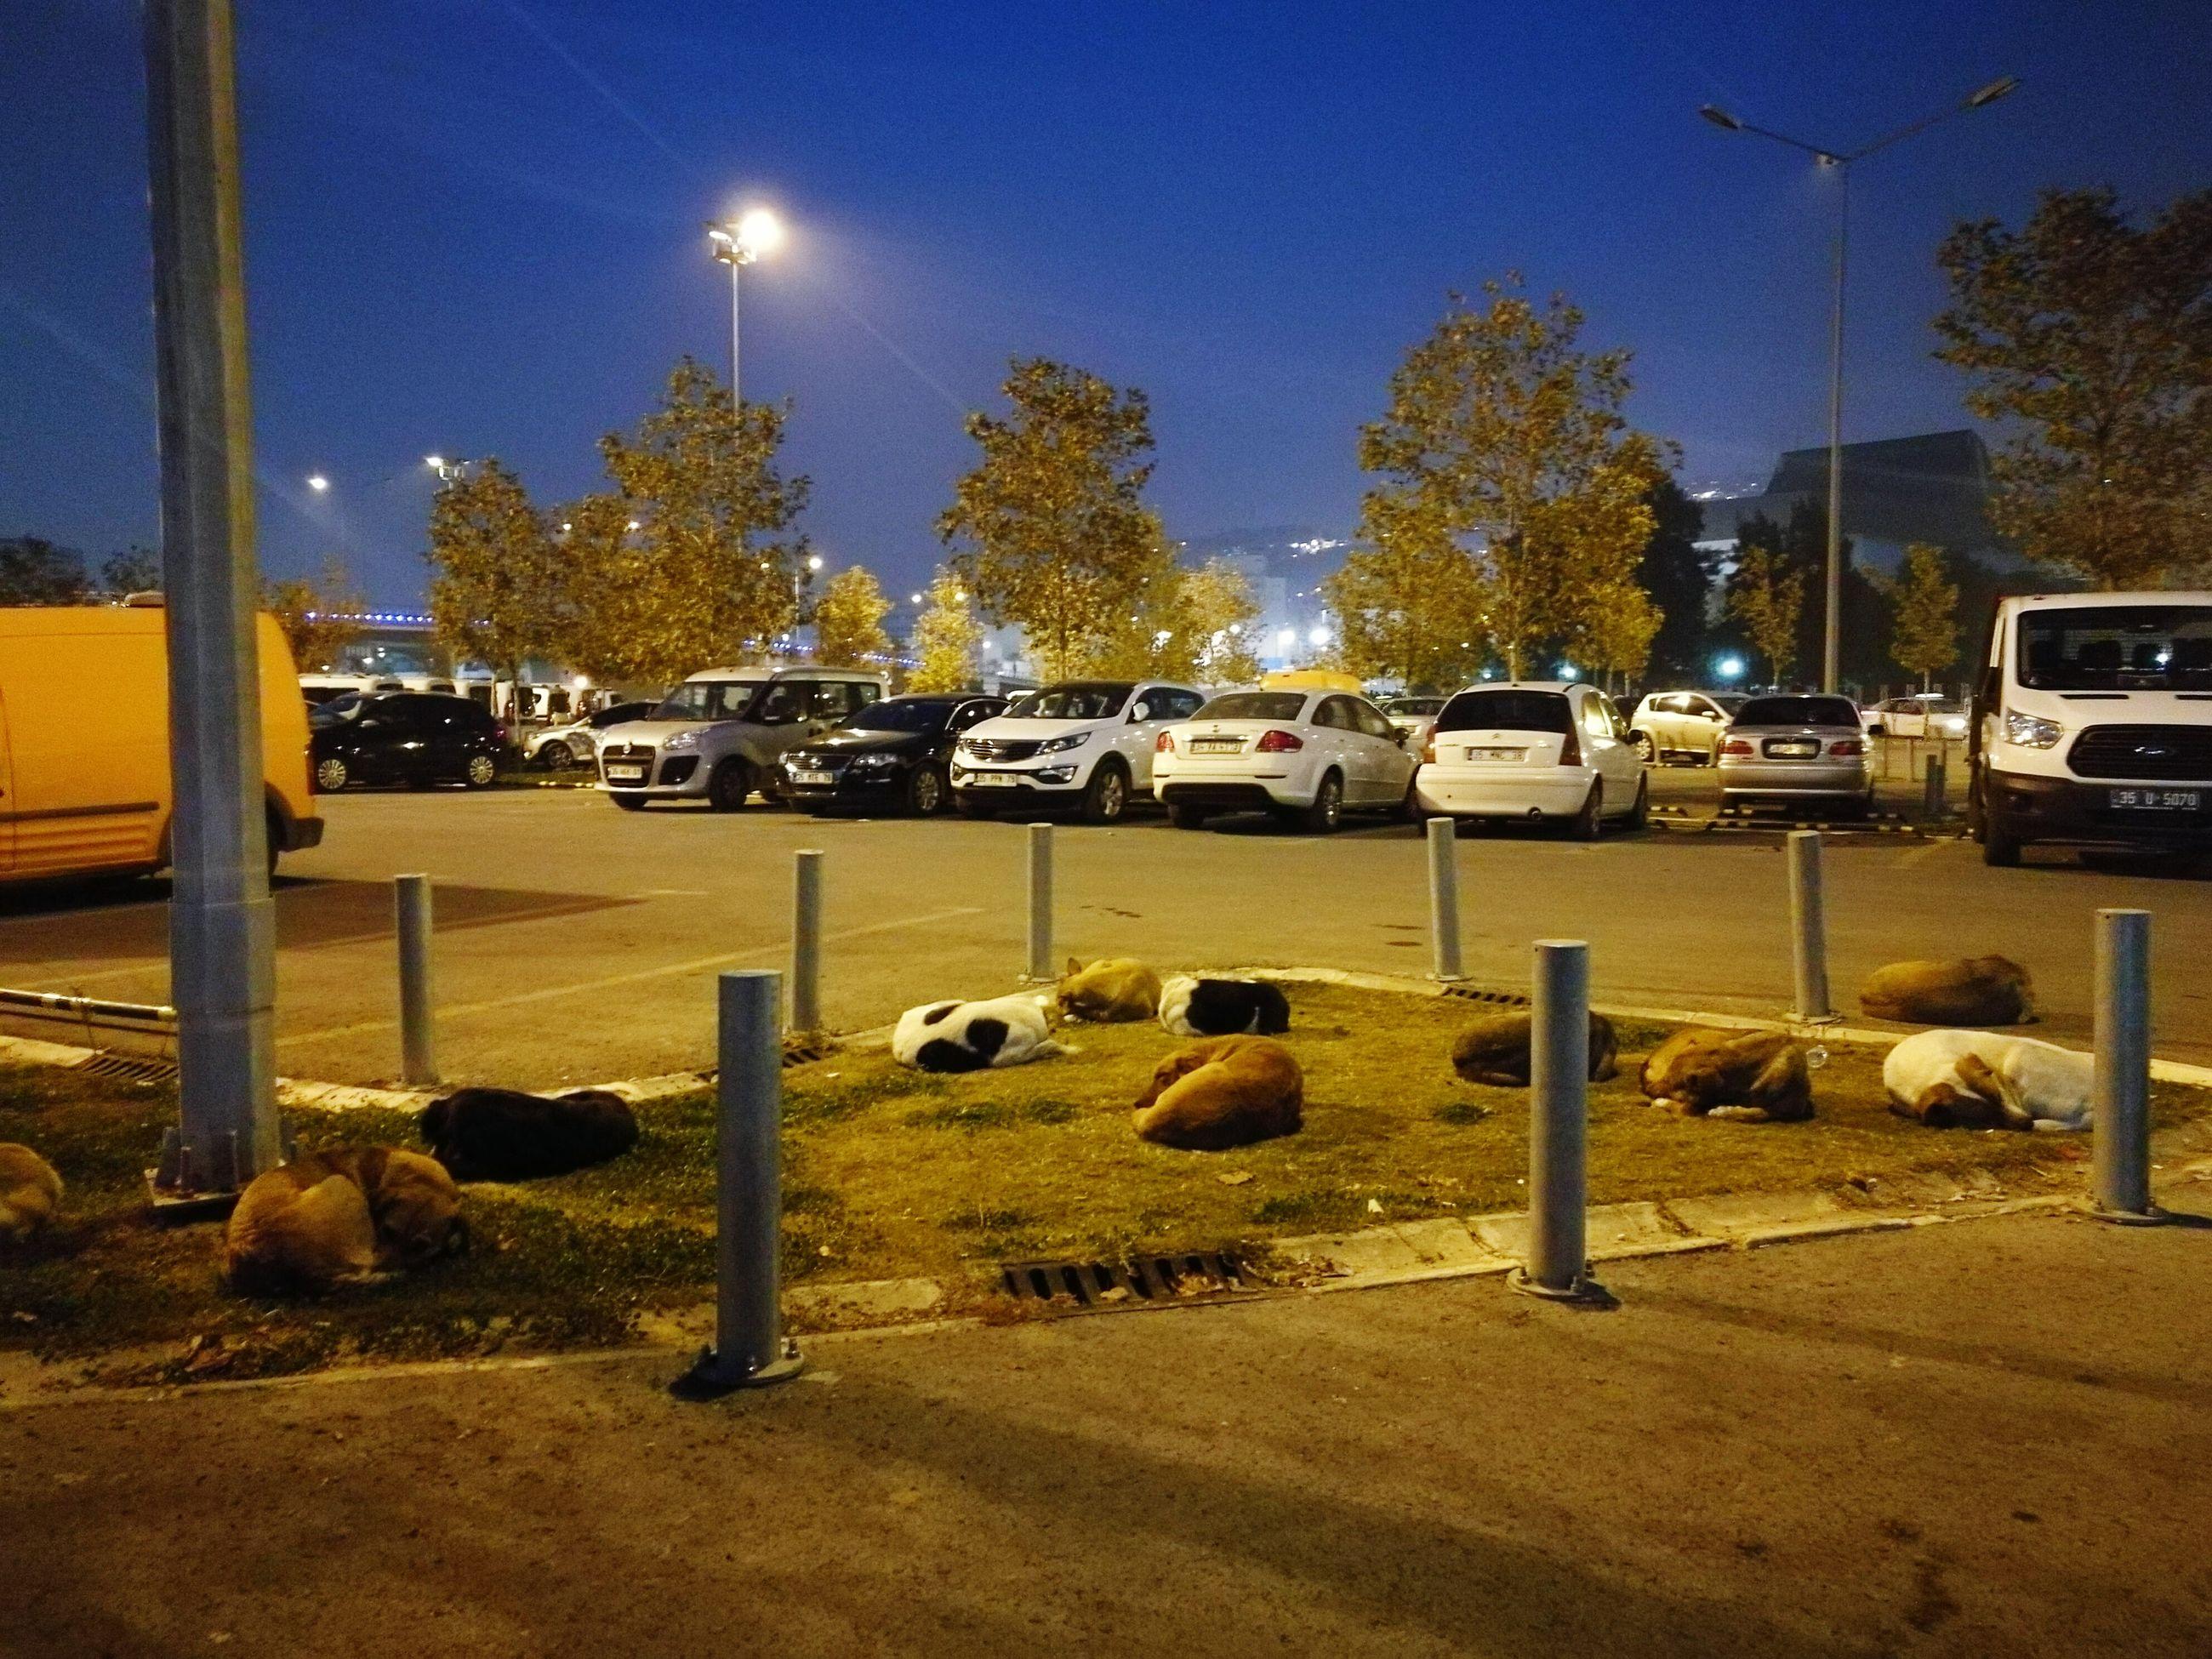 car, sky, no people, mode of transport, night, transportation, outdoors, land vehicle, illuminated, tree, nature